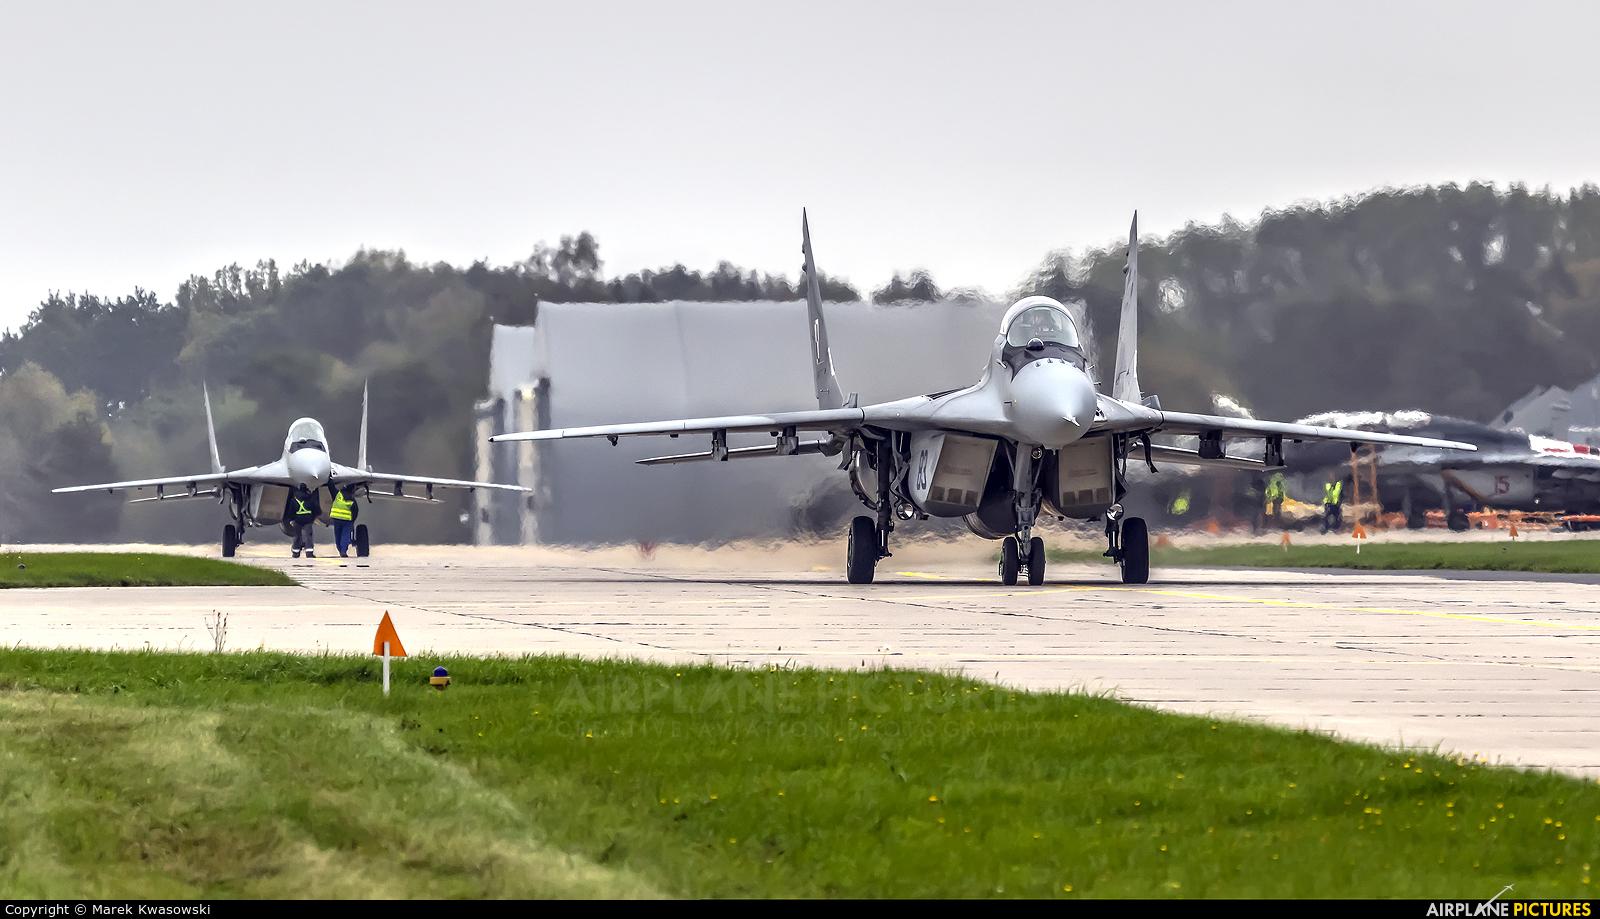 MiG Design Bureau 83 aircraft at Mińsk Mazowiecki